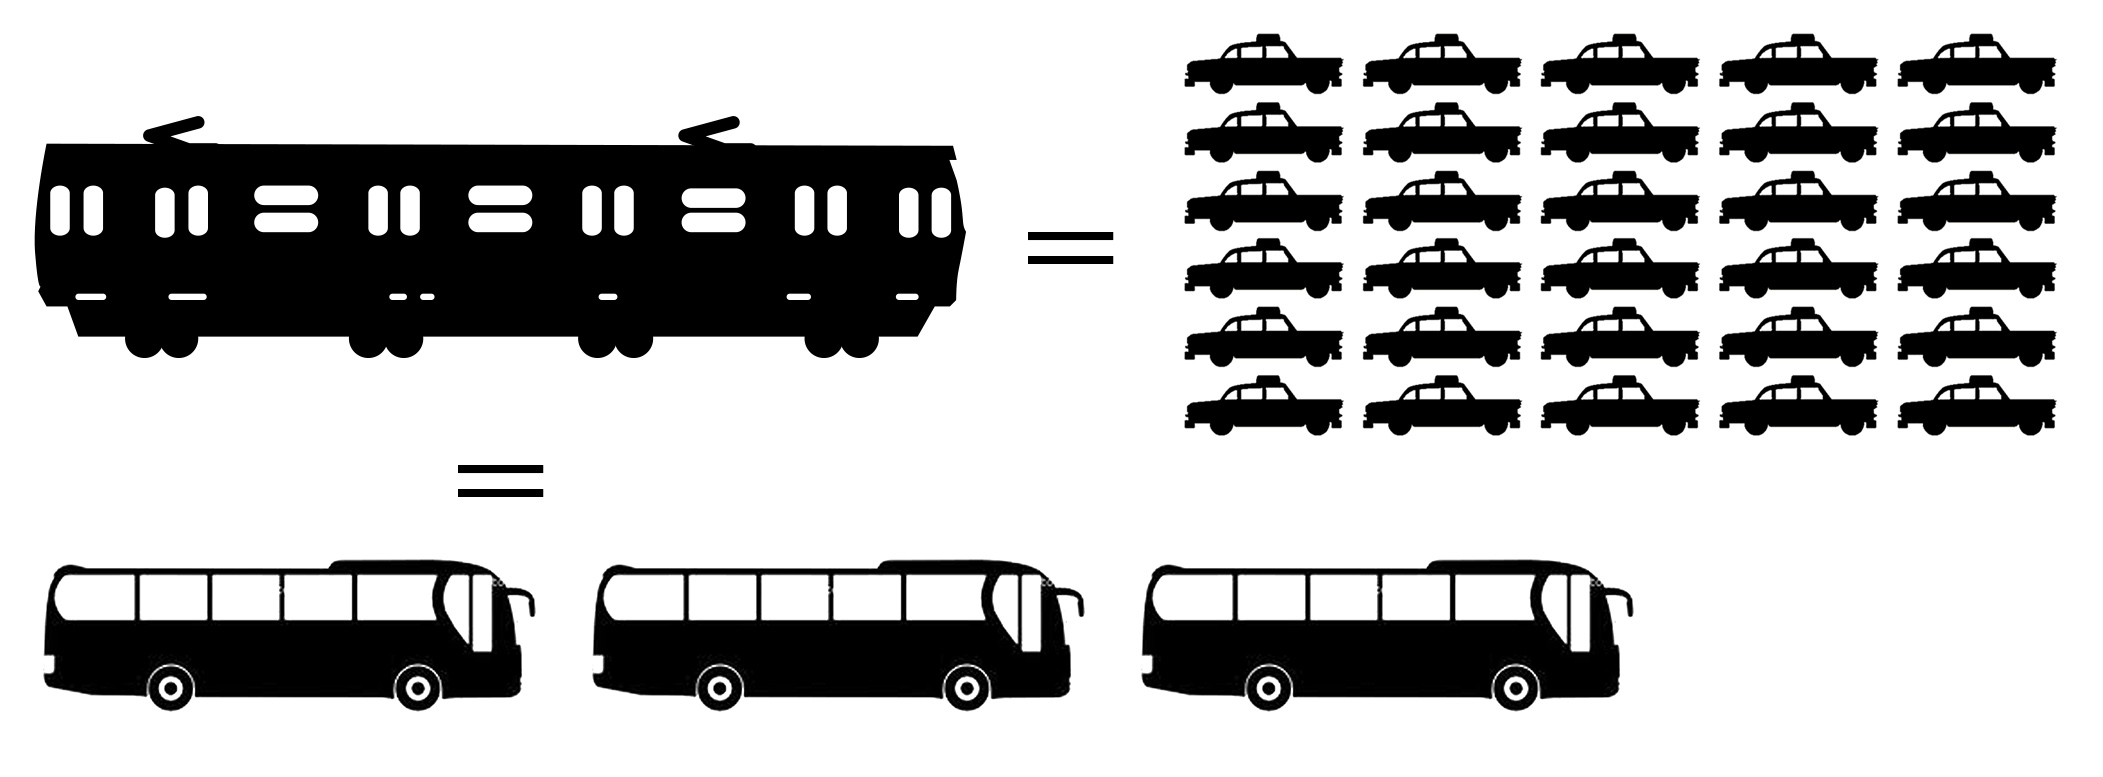 comparison of public transportation options with automobiles